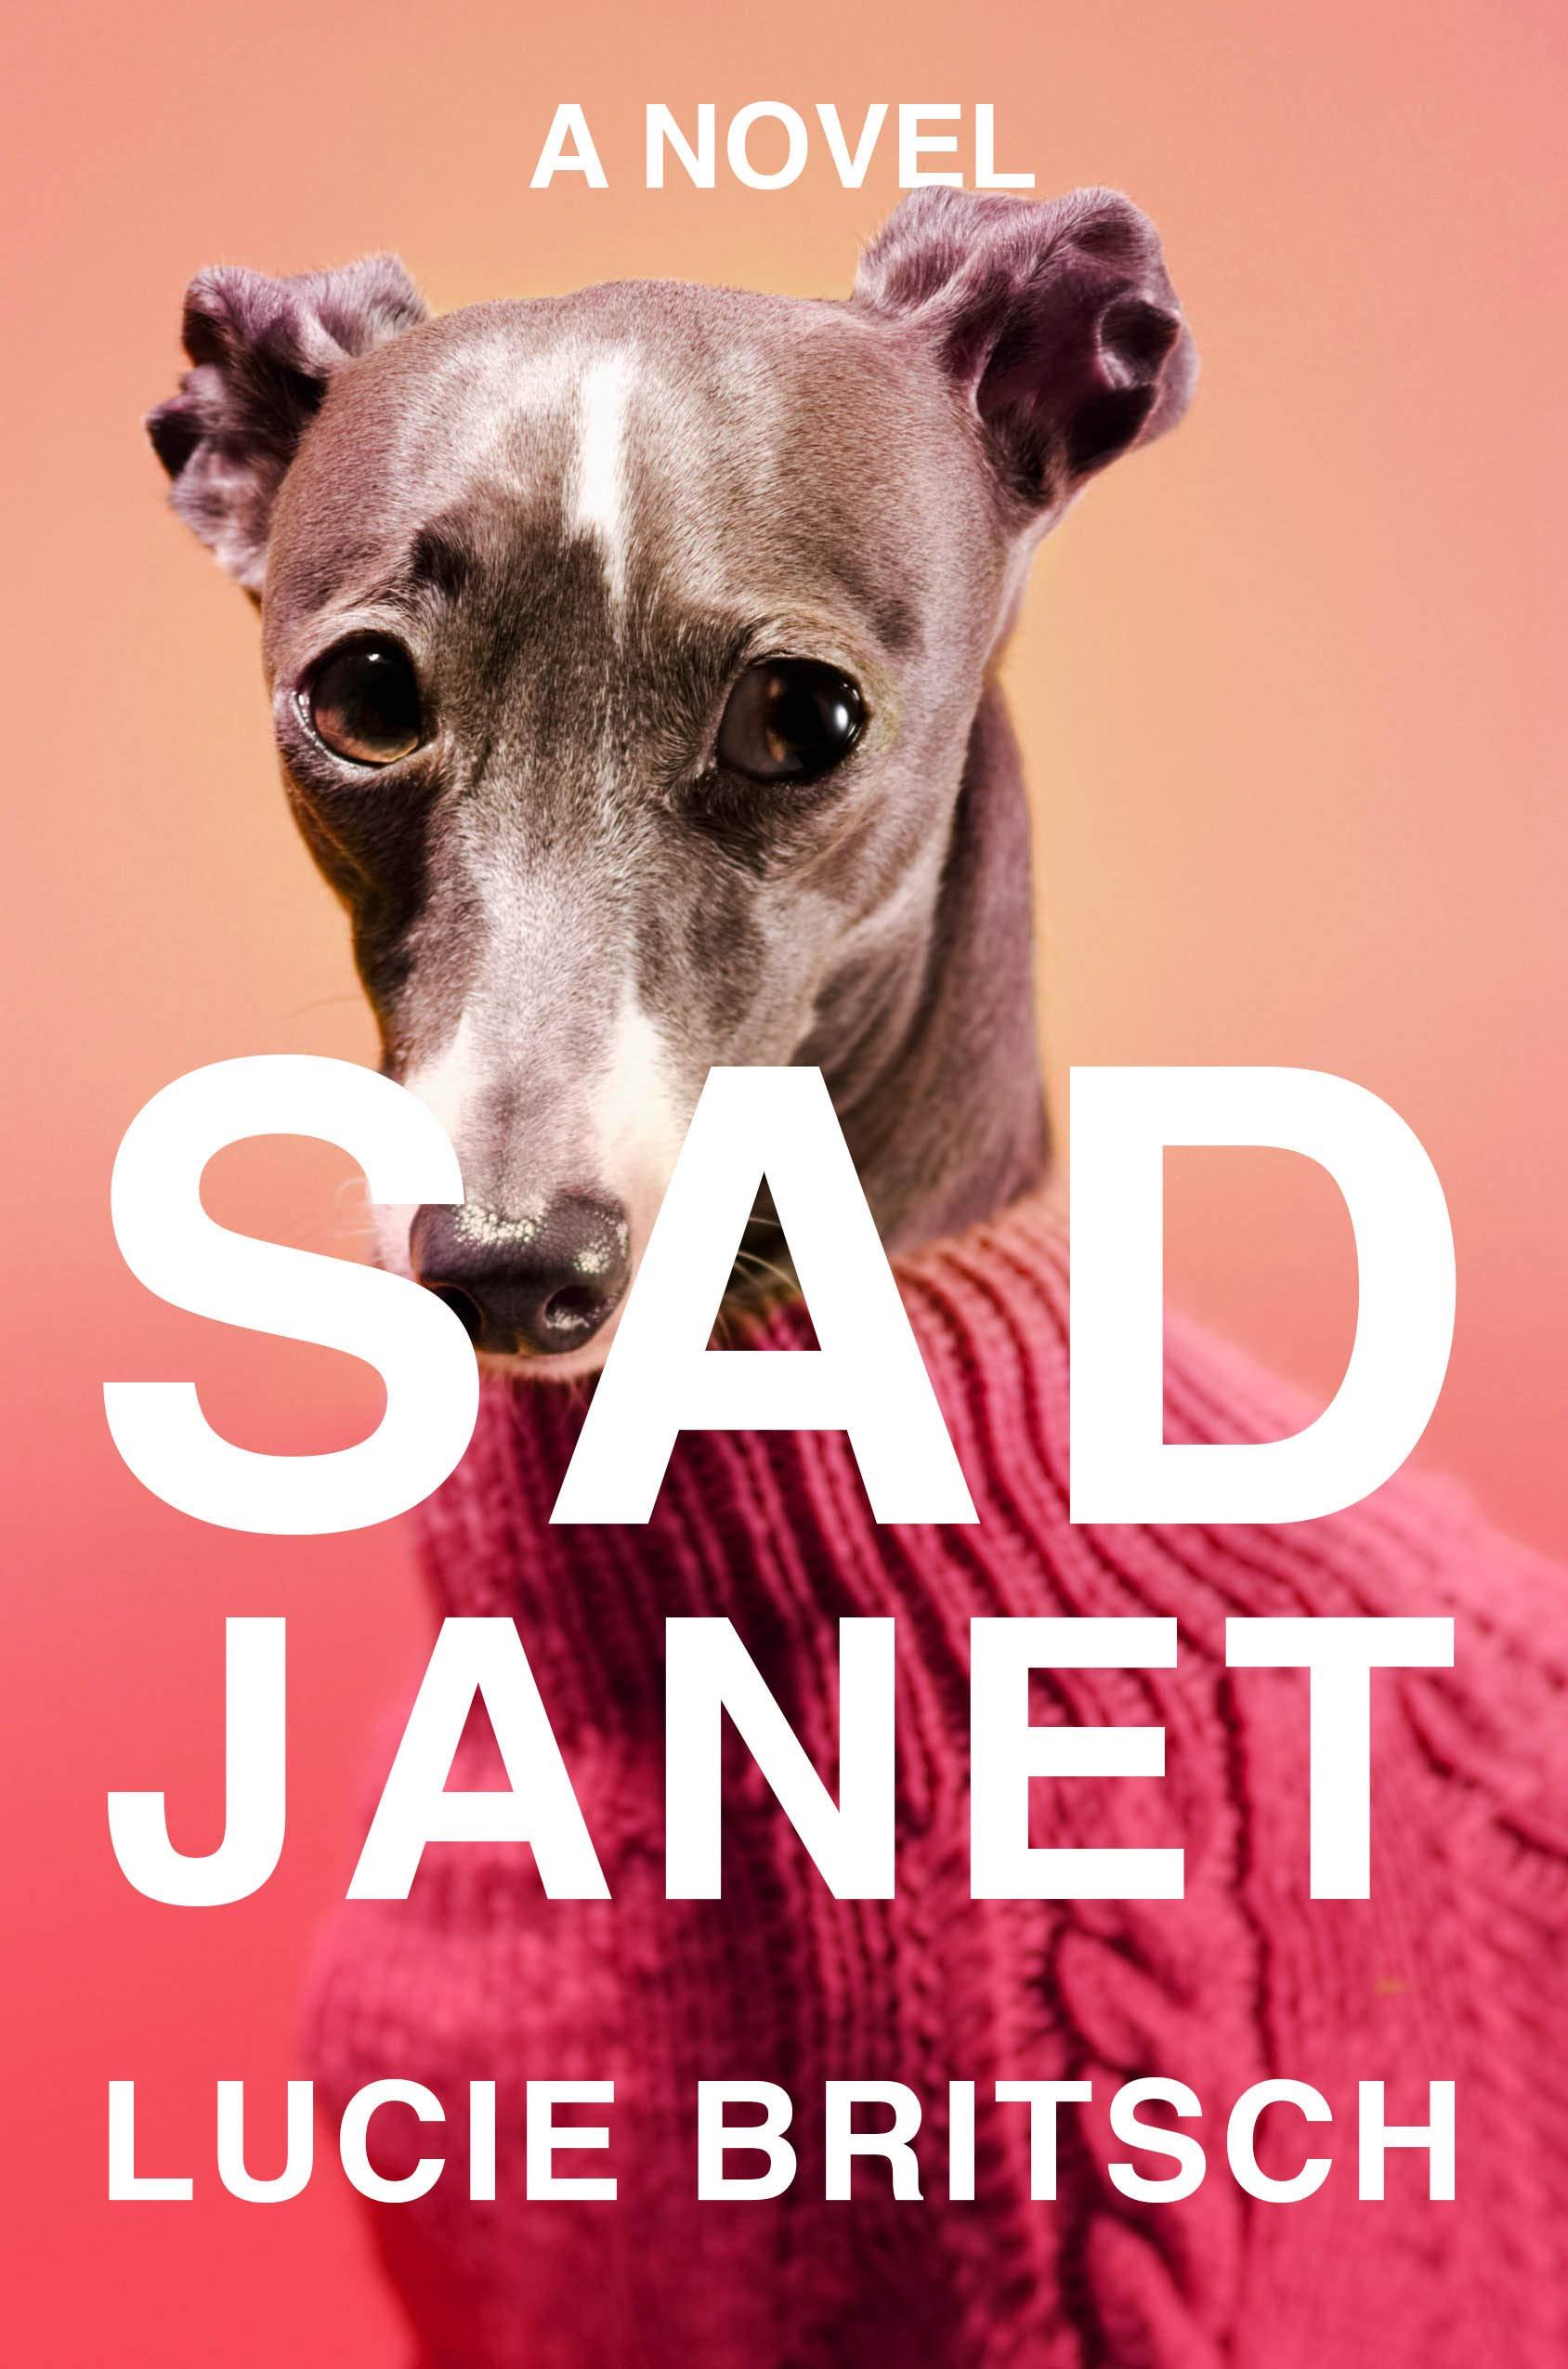 Lucie Britsch, <em>Sad Janet</em>; cover design by Na Kim (Riverhead, July 16)